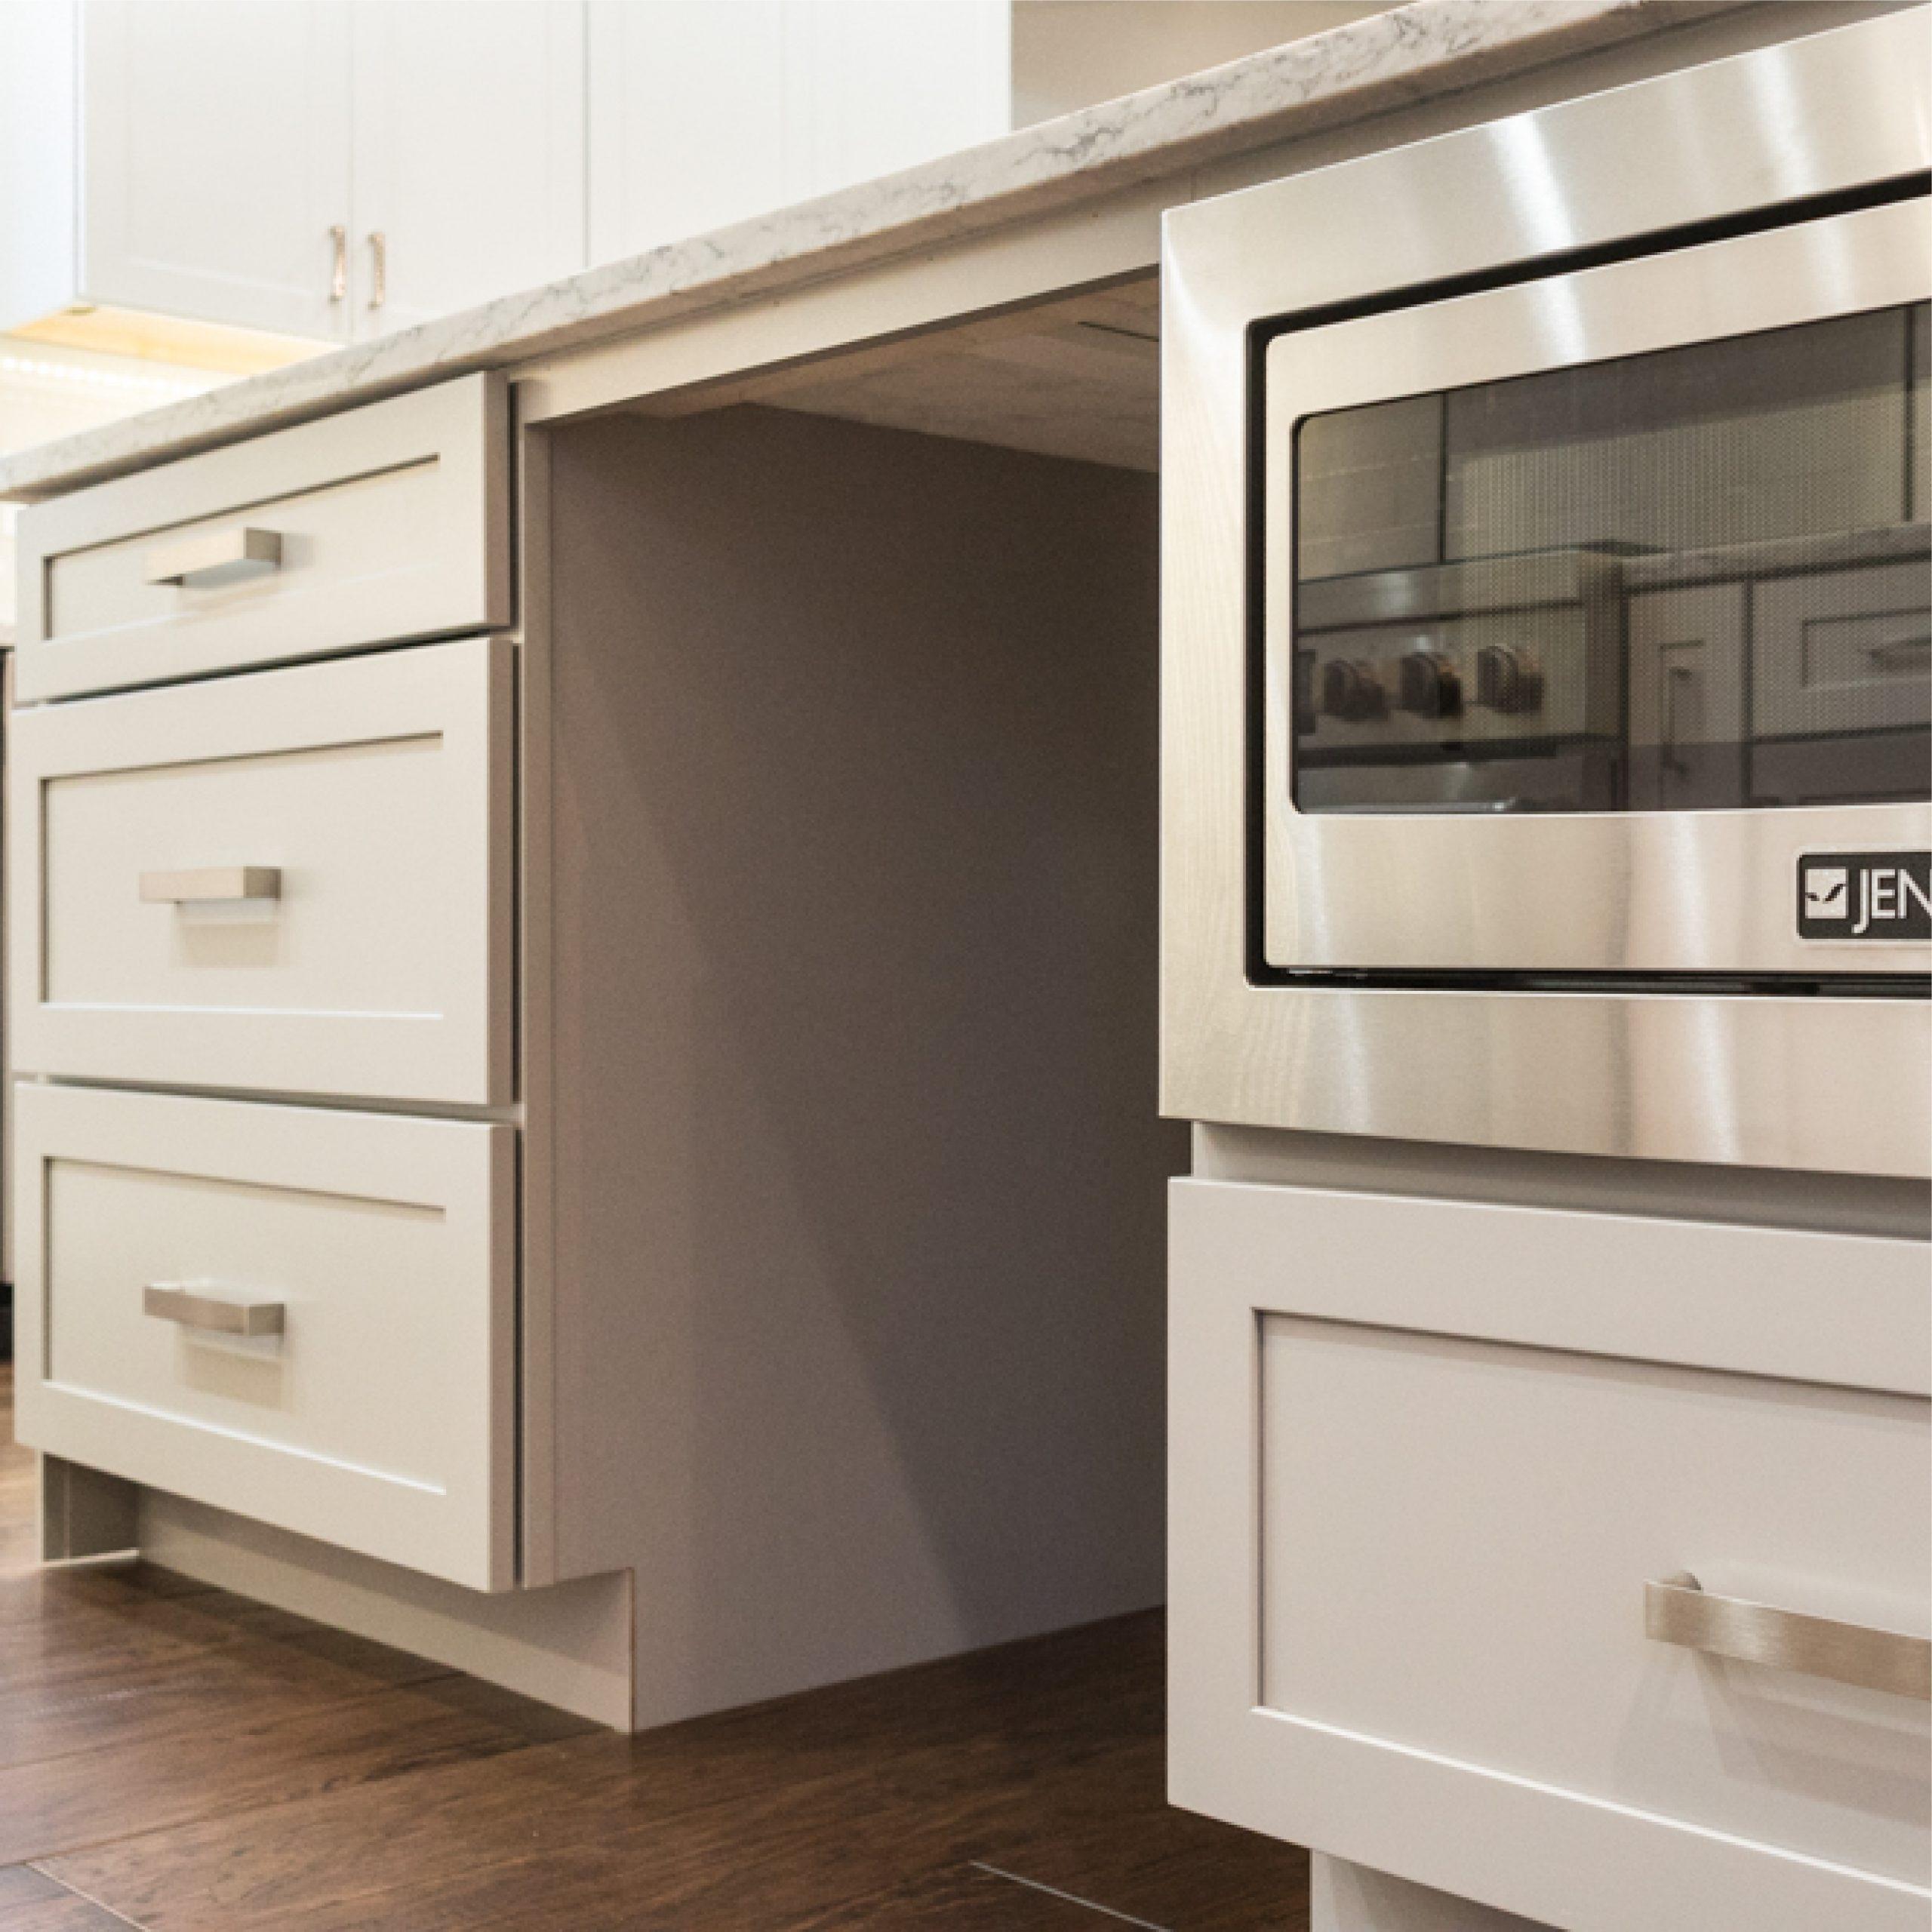 Custom Kitchen Cabinets in West Michigan